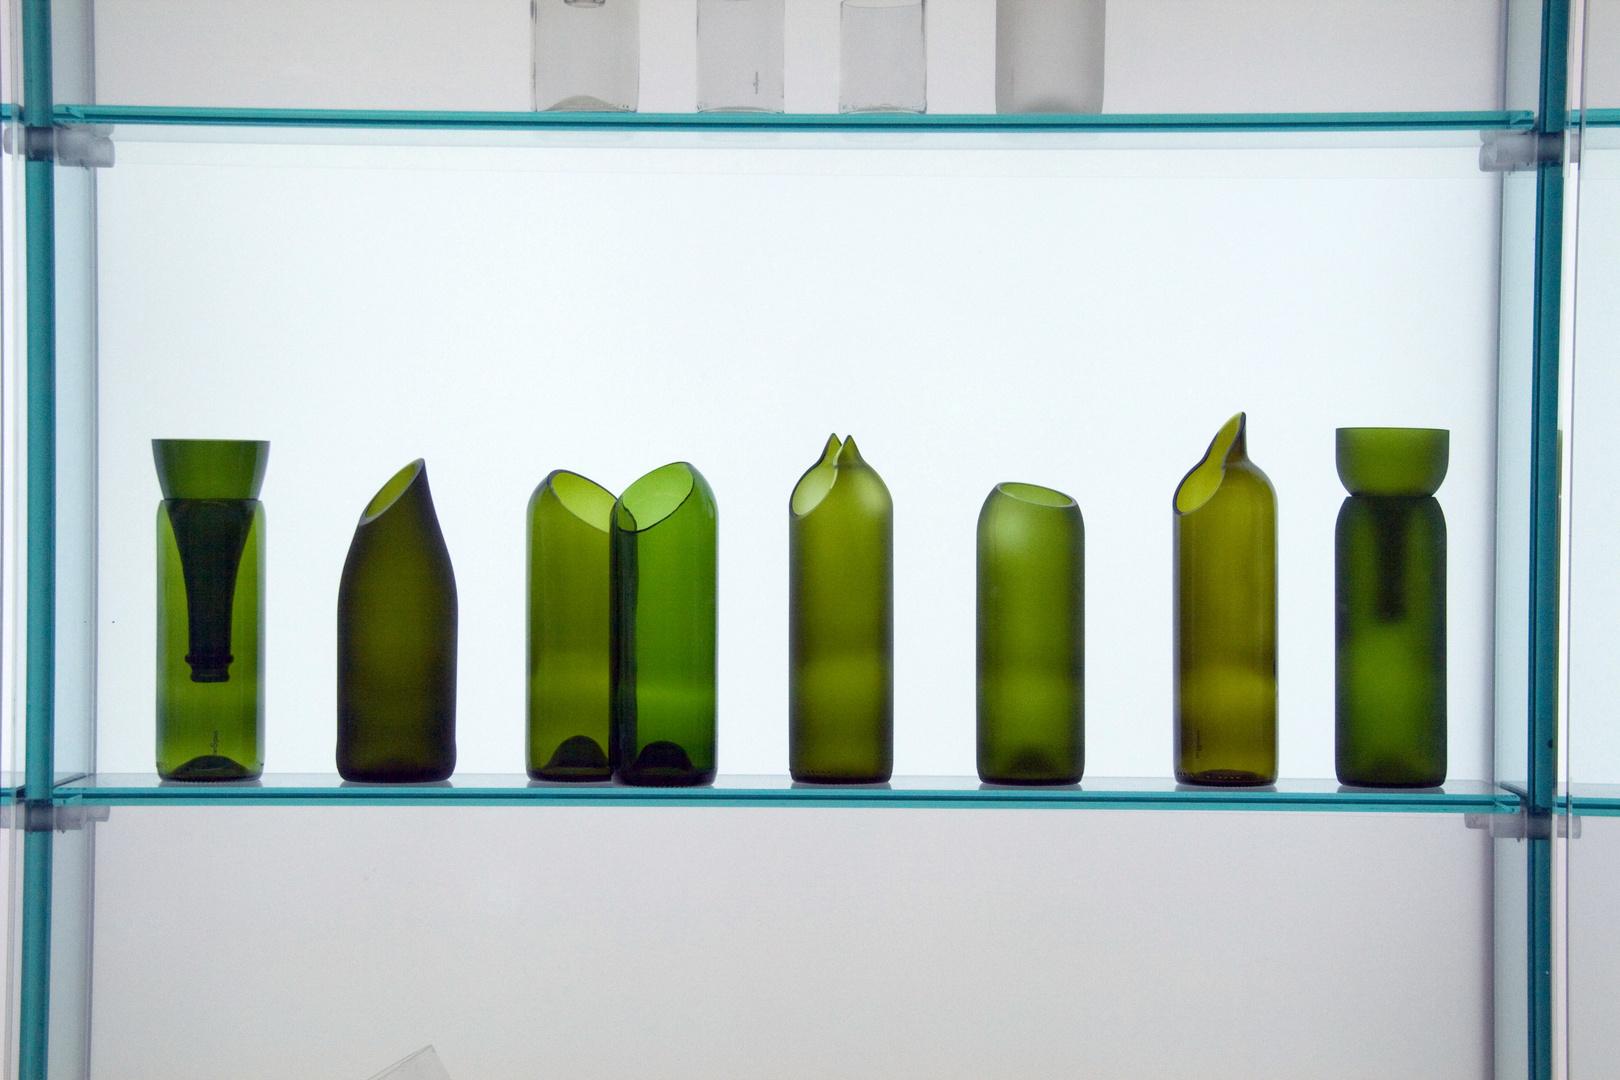 Glass Art at Columbus Circle